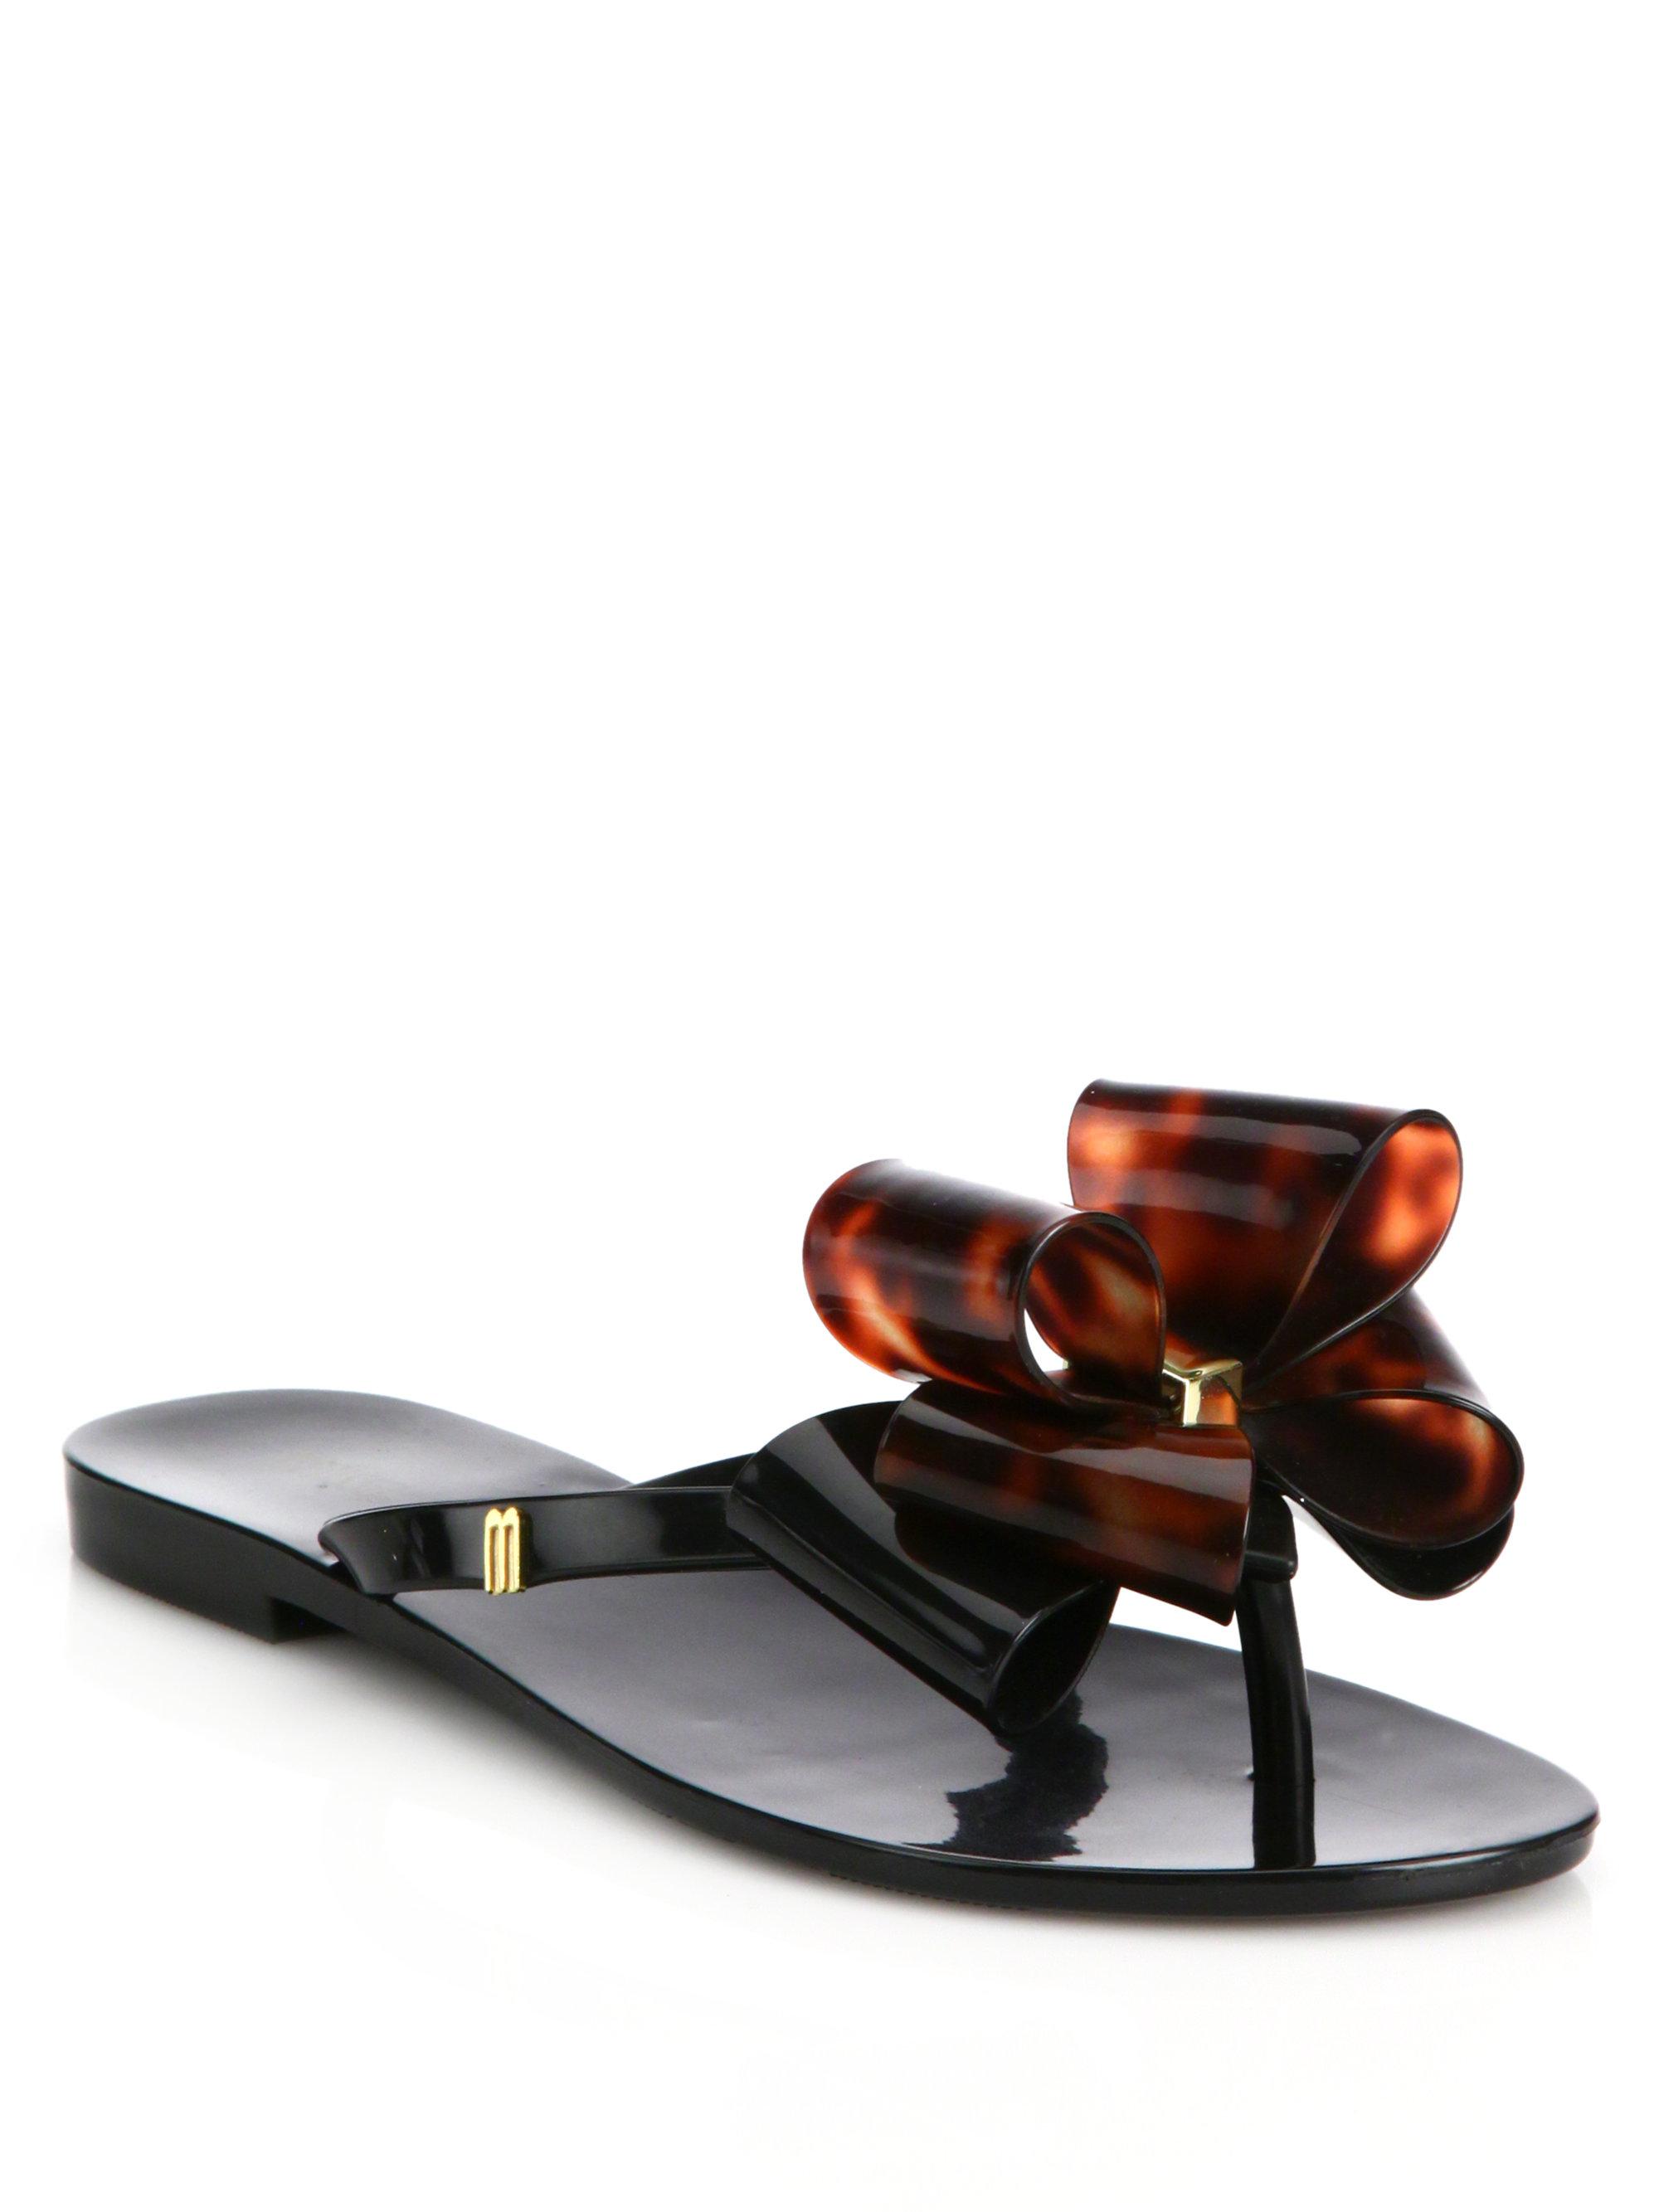 51a48bf9c53e8 Lyst - Melissa Harmonic Ix Bow Sandals in Black